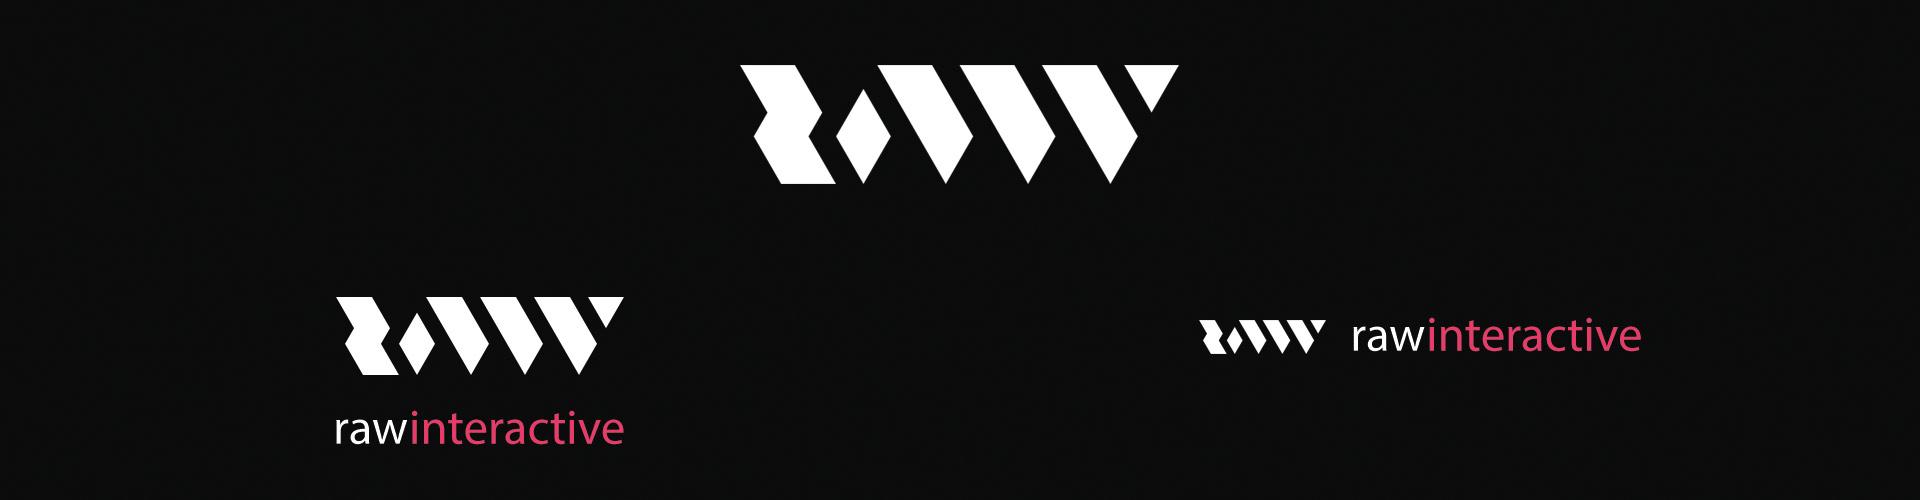 RAW Interactive - RAW Logo Layouts - THAT Branding Company - Creative Design and Branding Agency in Newcastle and Gateshead.jpg